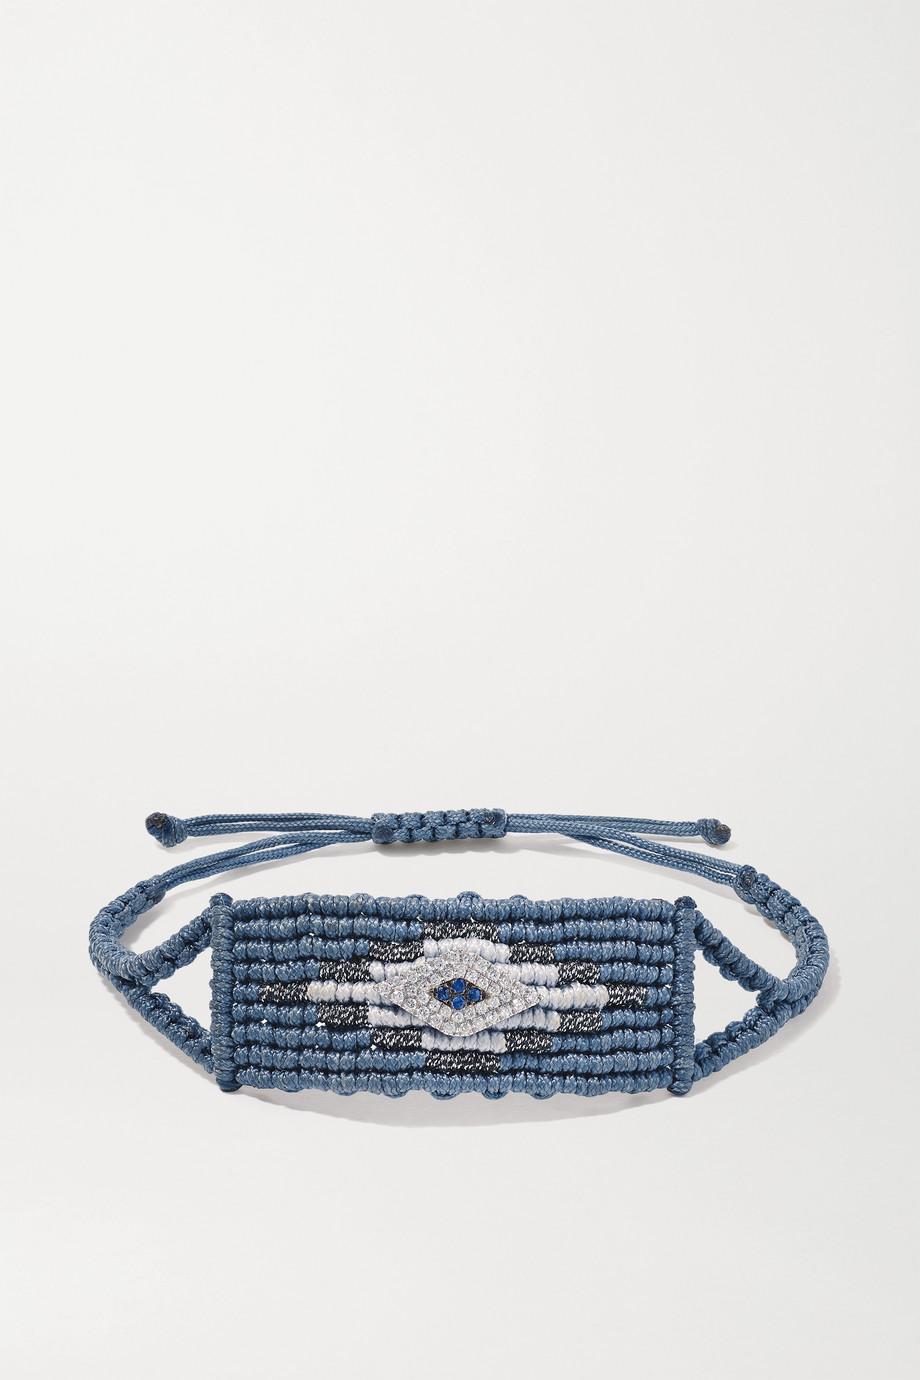 Diane Kordas Evil Eye 钻石、蓝宝石、编织手绳